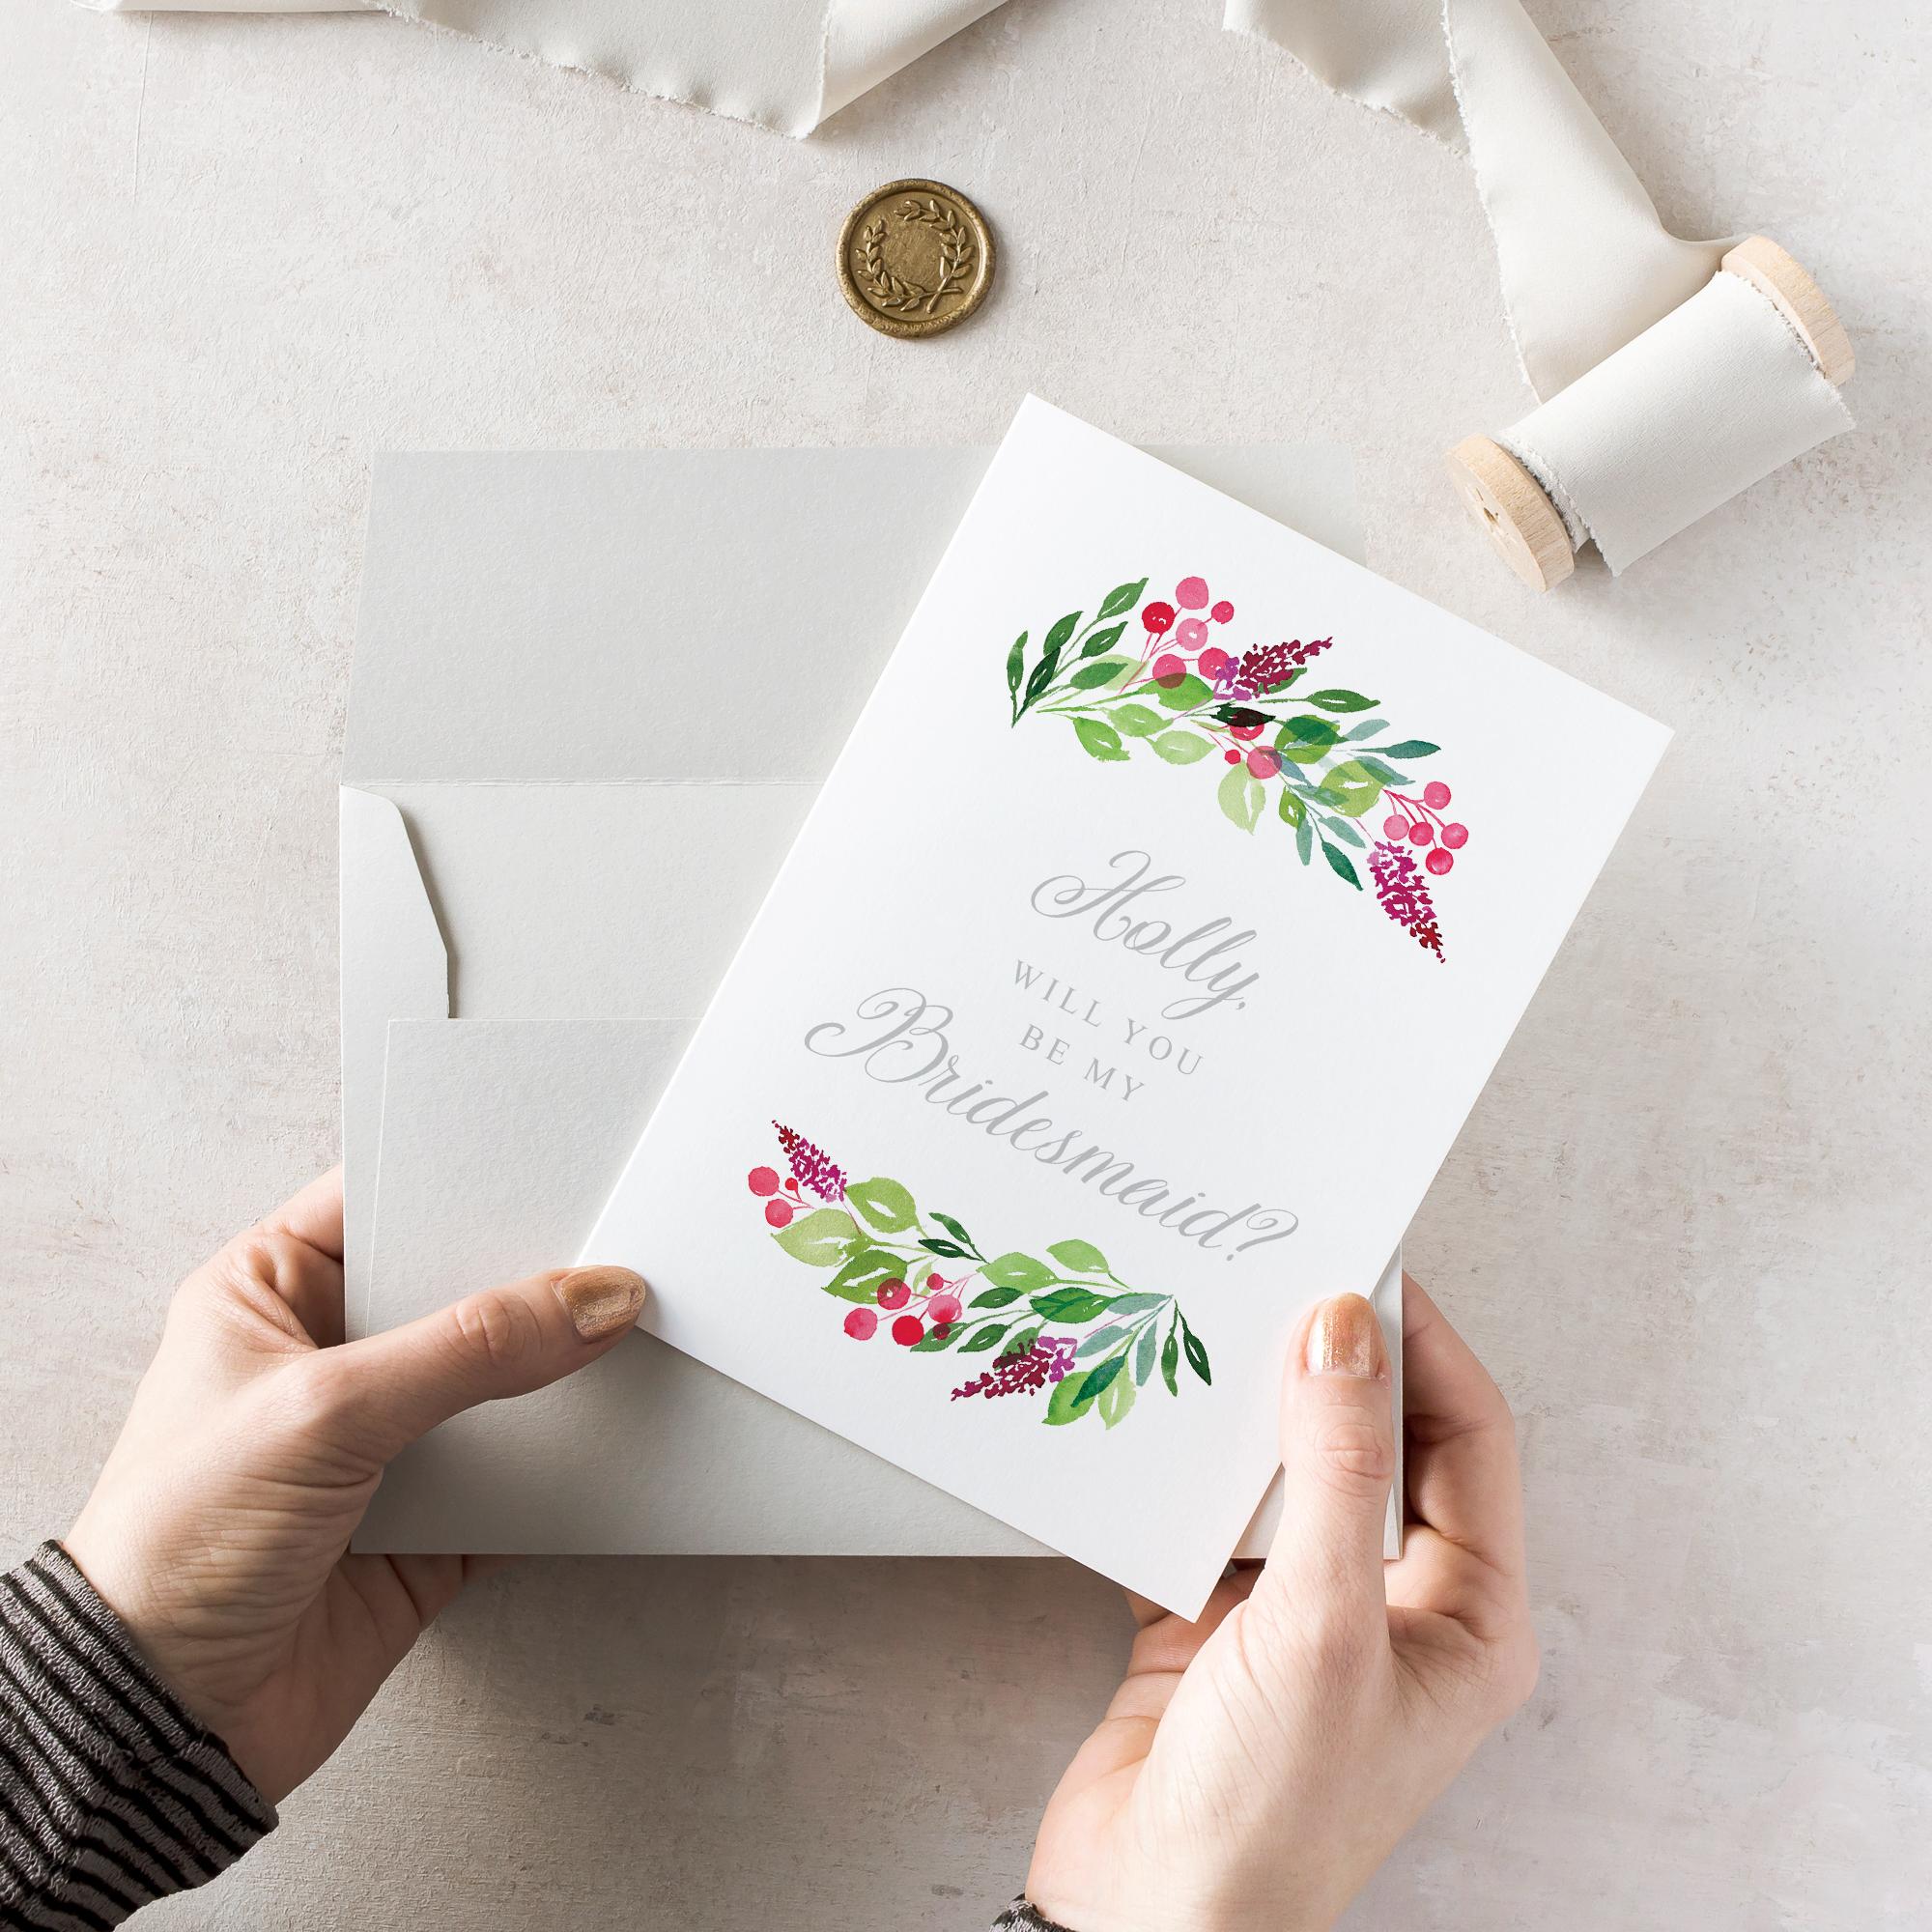 Personalised Wax Seal Bridesmaid Proposal Card, Will You Be My Bridesmaid Card, Say You'll Be My Bridesmaid Card, Card For Bridesmaid, Hand Painted Watercolour Floral Pink  Berries Flatlay - Bridesmaid.jpg